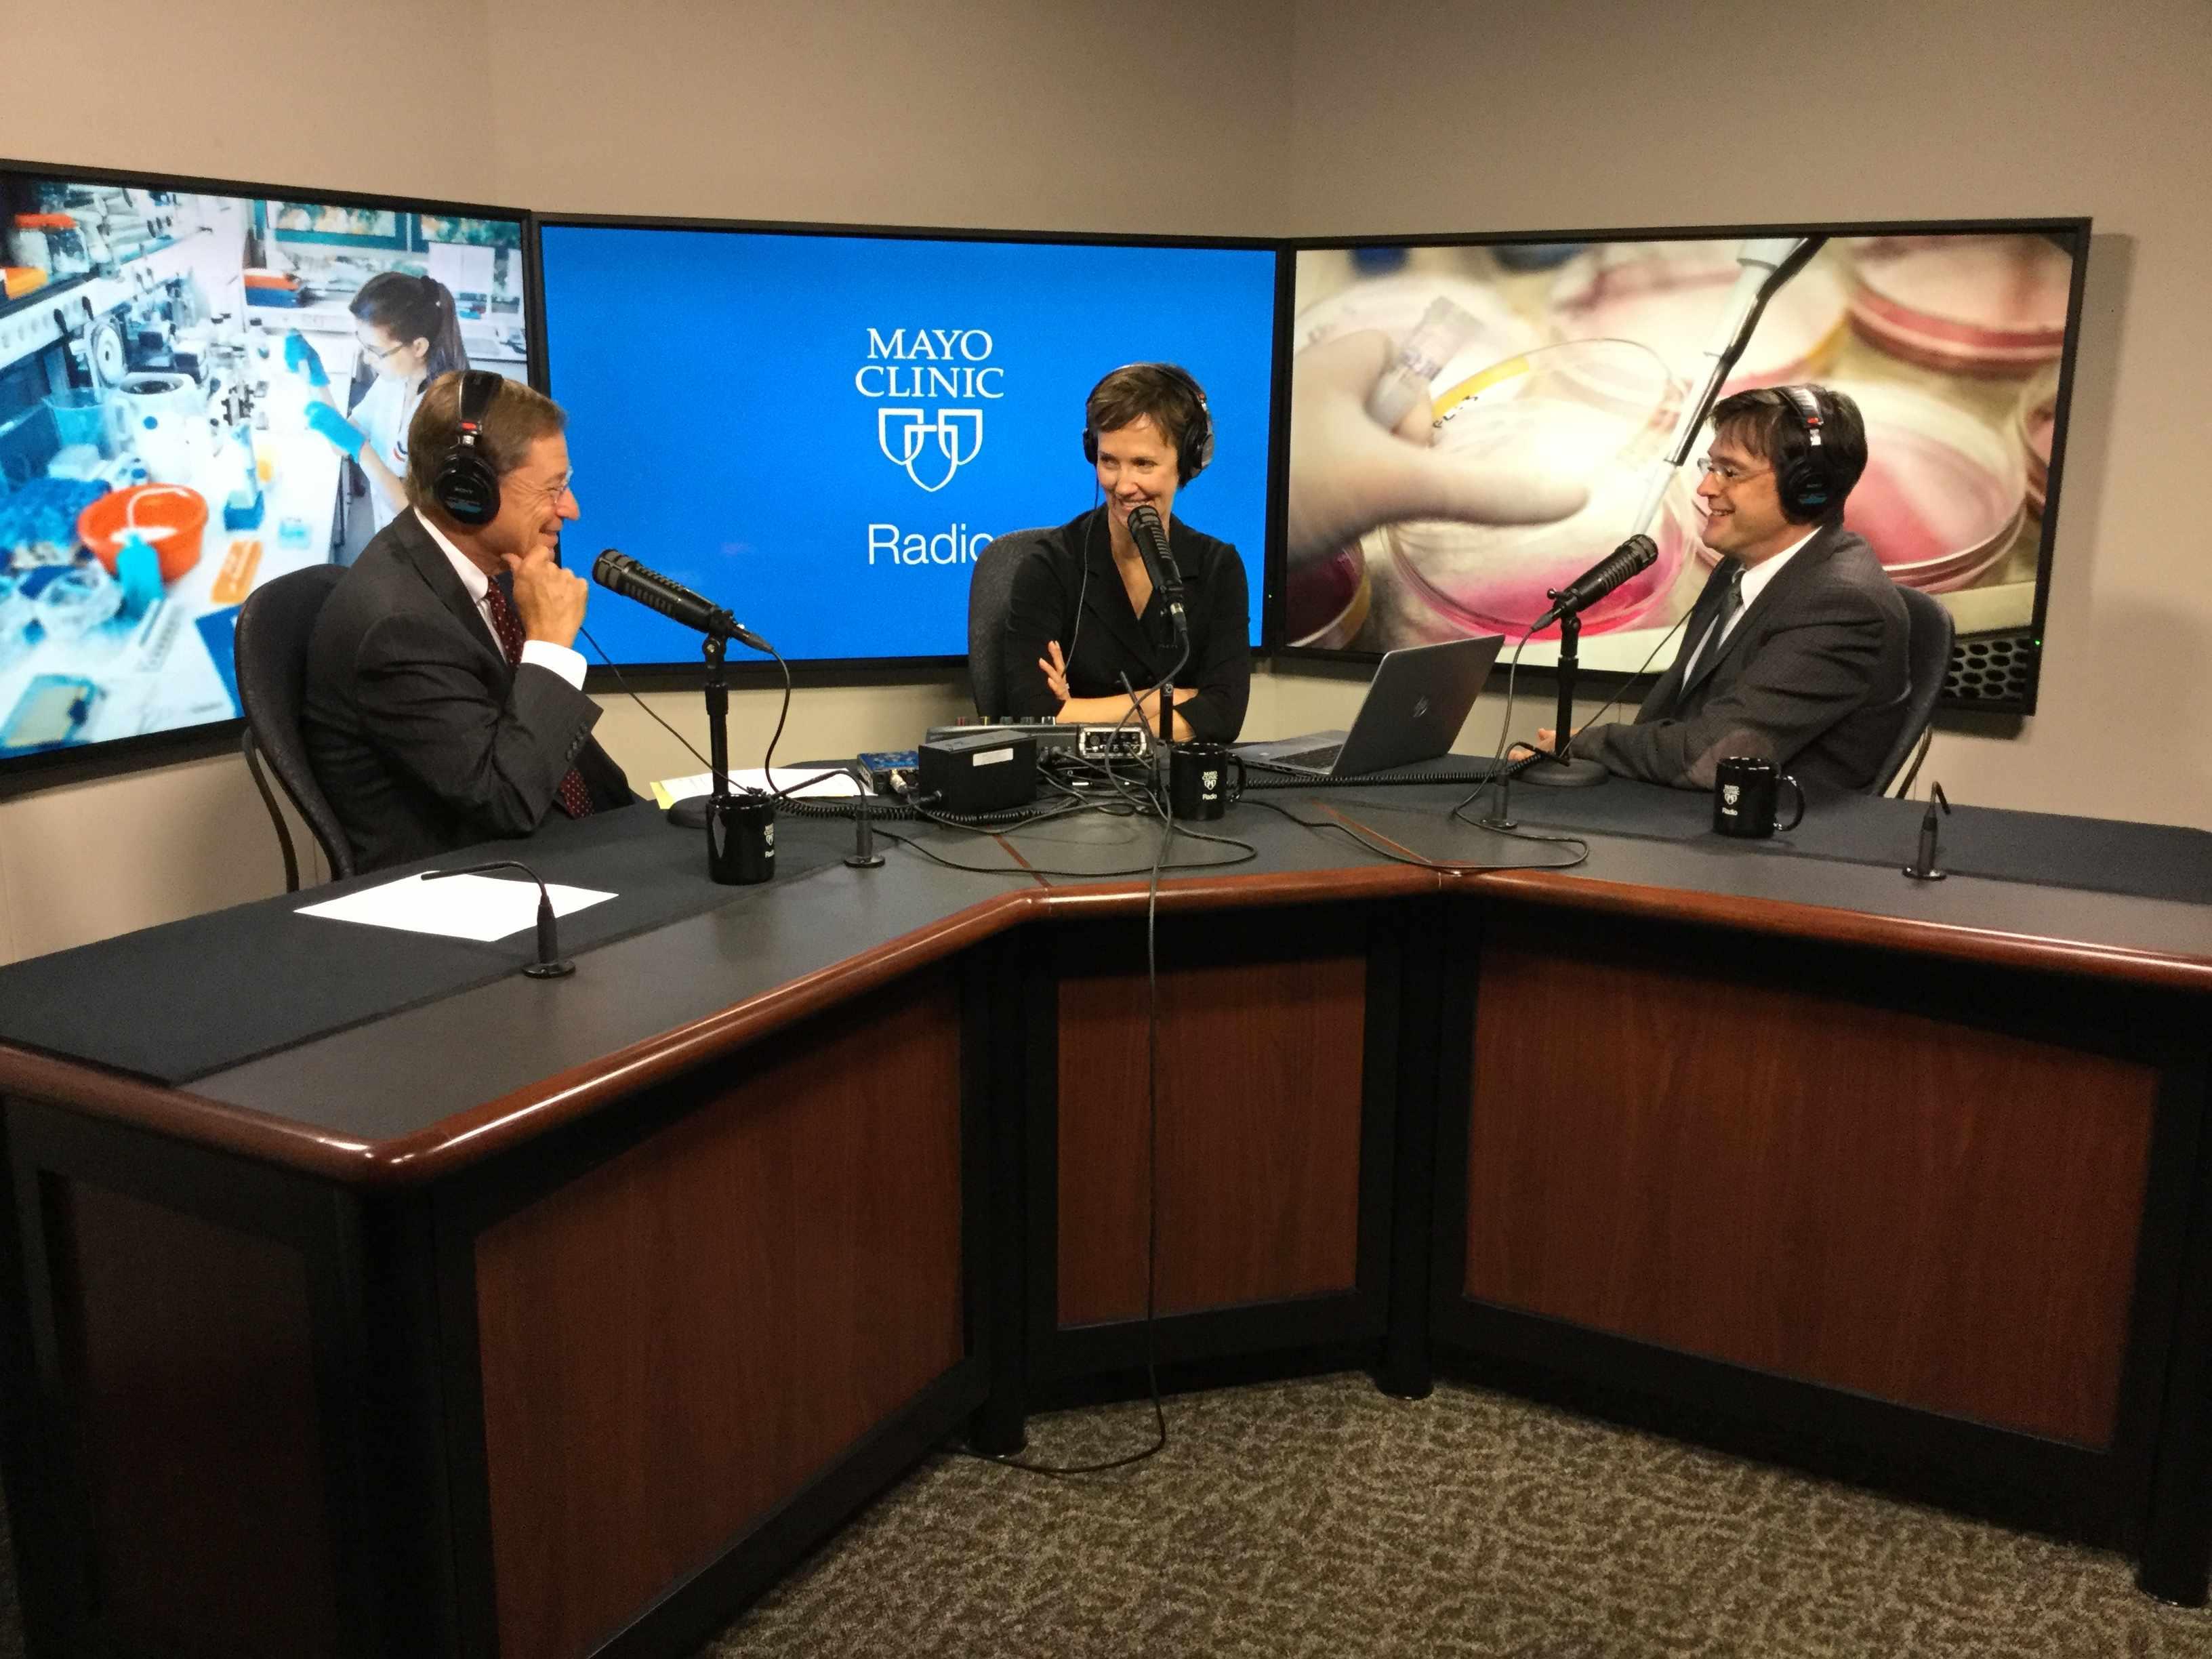 Dr. Svetomir Markovic being interviewed on Mayo Clinic Radio